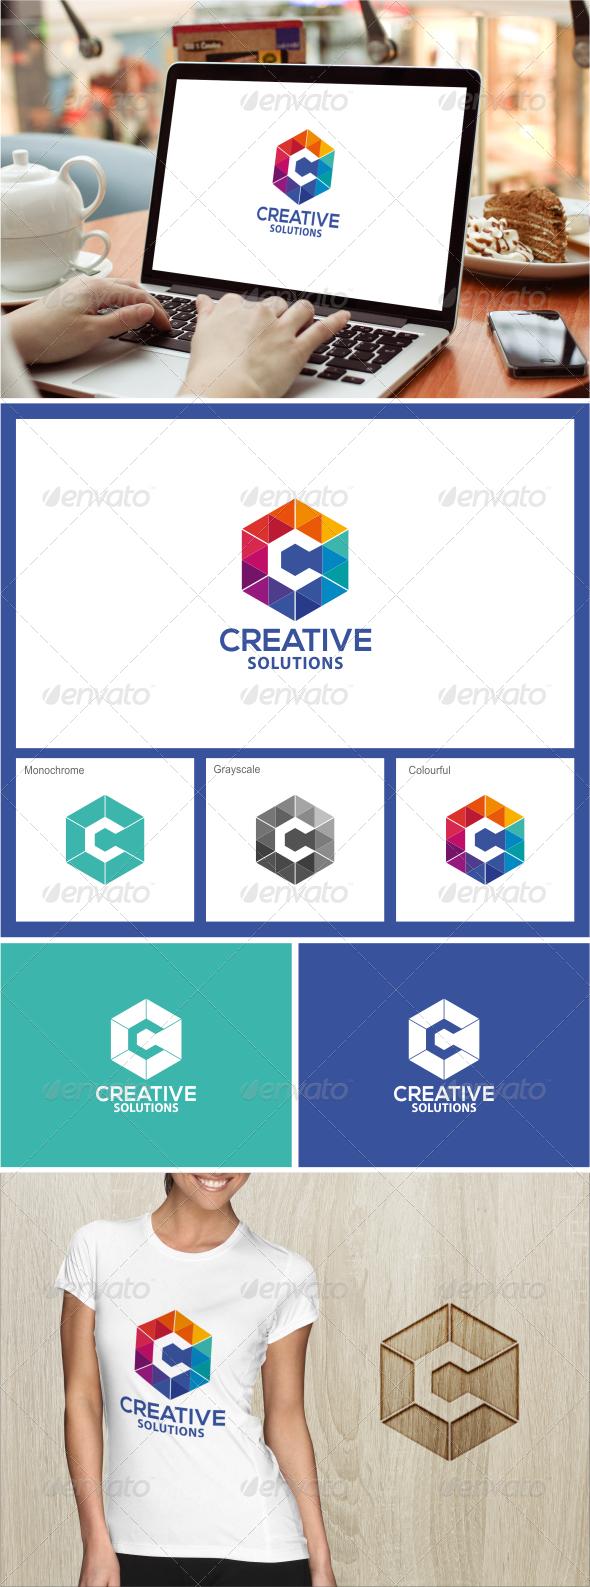 GraphicRiver Creative Solutions Logo template 7796320